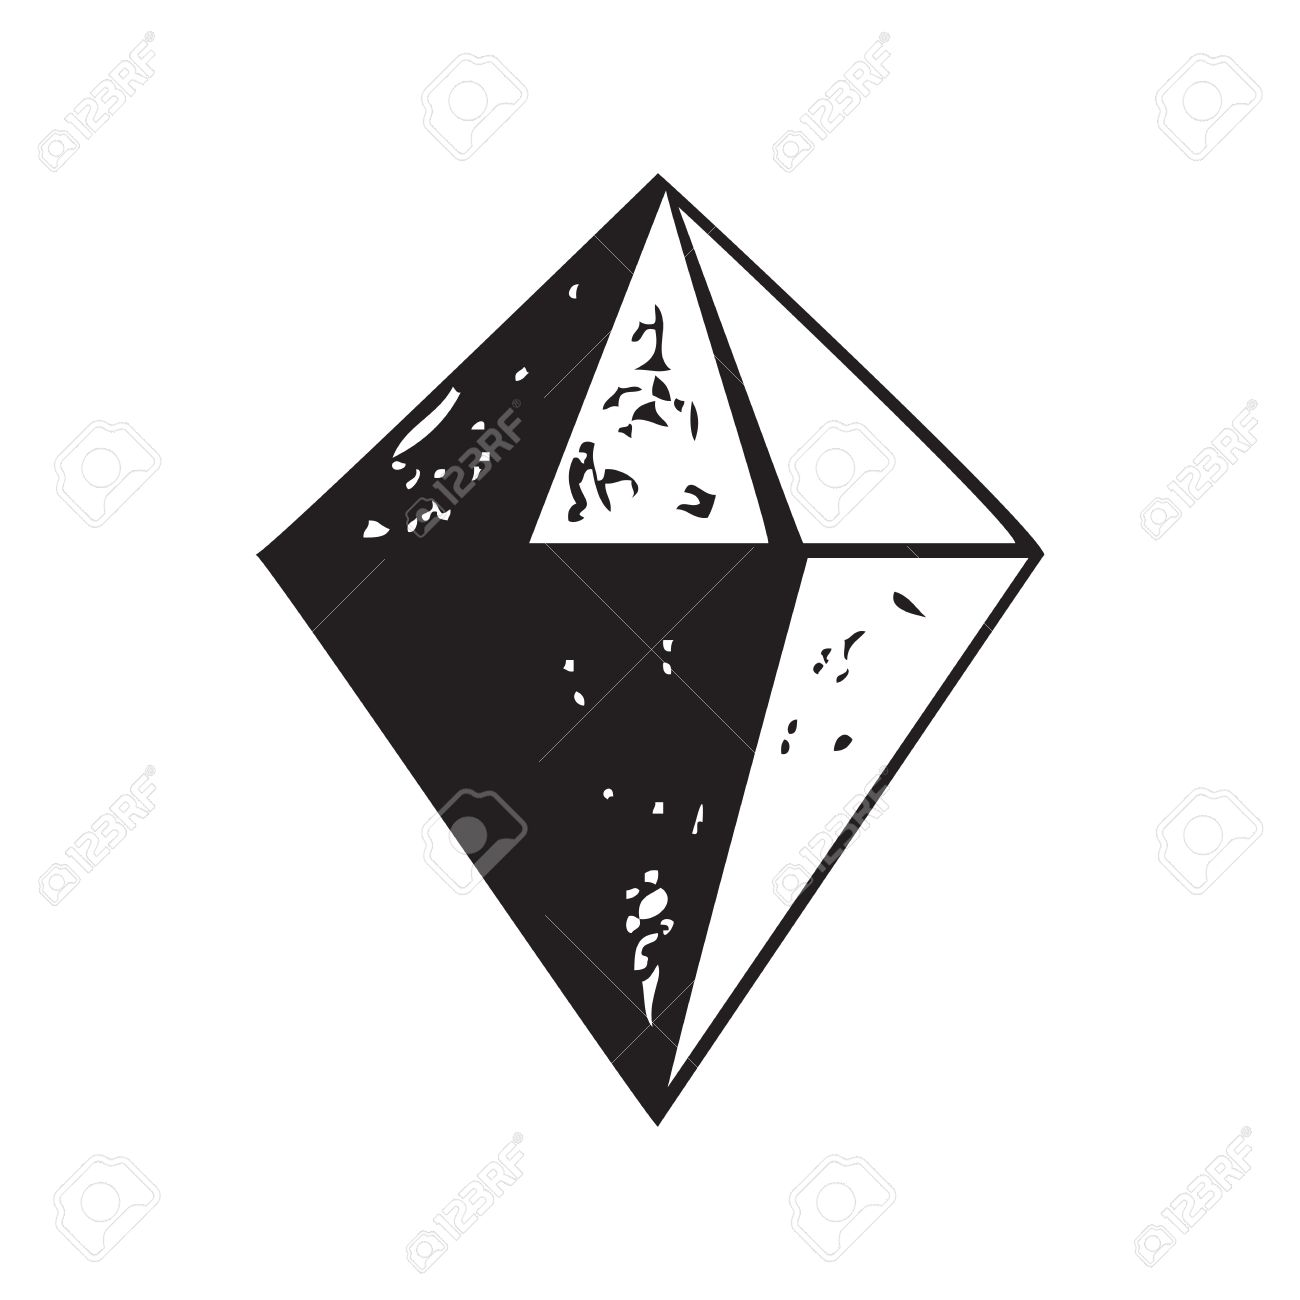 diamond shape icon isolated vector illustration royalty free